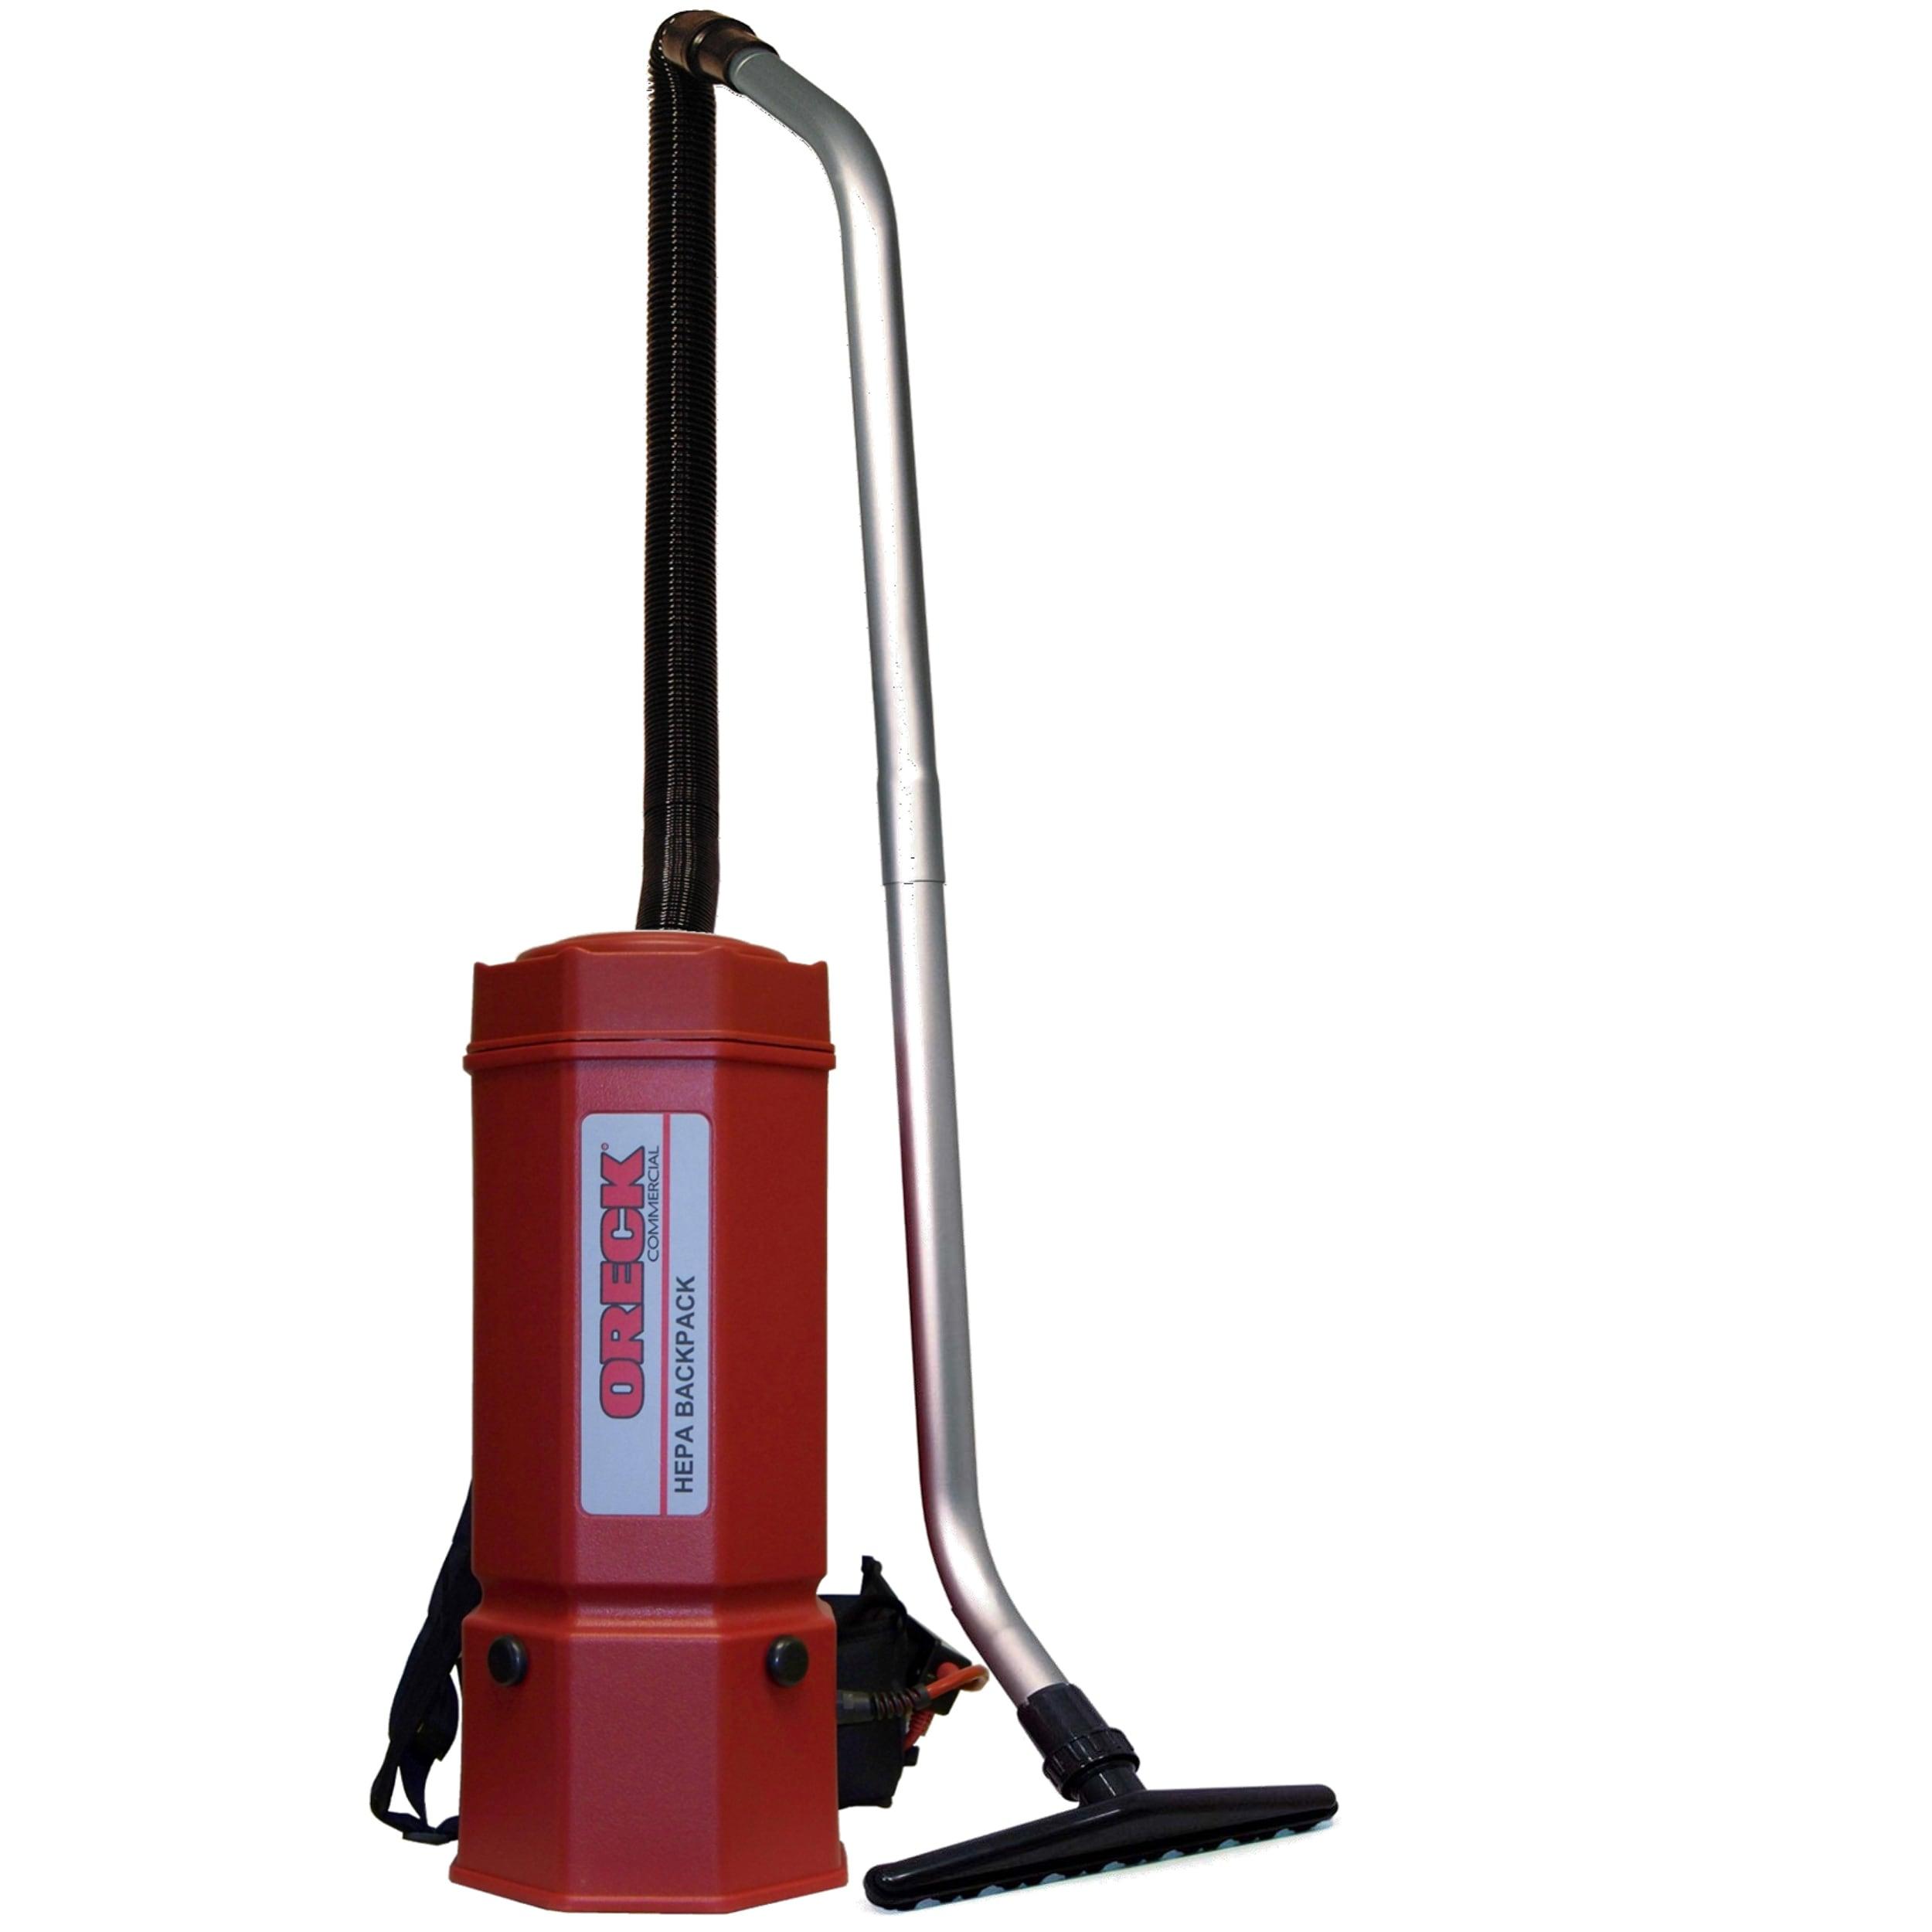 Carpet Pro Scbp 1 Backpack Vacuum Cleaner Reviews Carpet